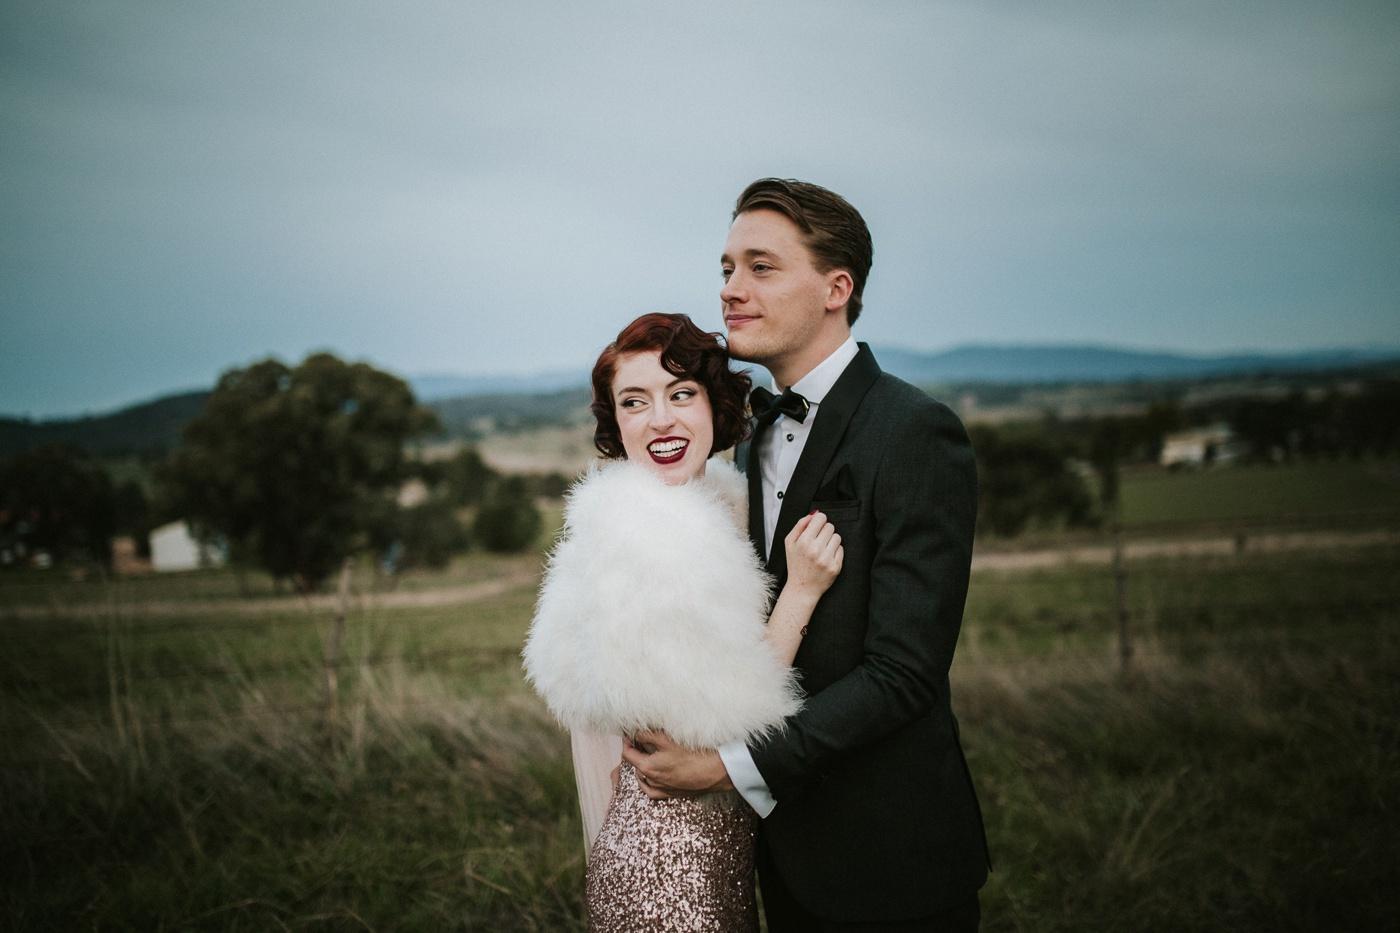 Emma&Morgan_Melbourne-Vintage-Elegant-Fun-Quirky-Yarra-Valley-Vineyard-Wedding_Melbourne-Wedding-Photography-80